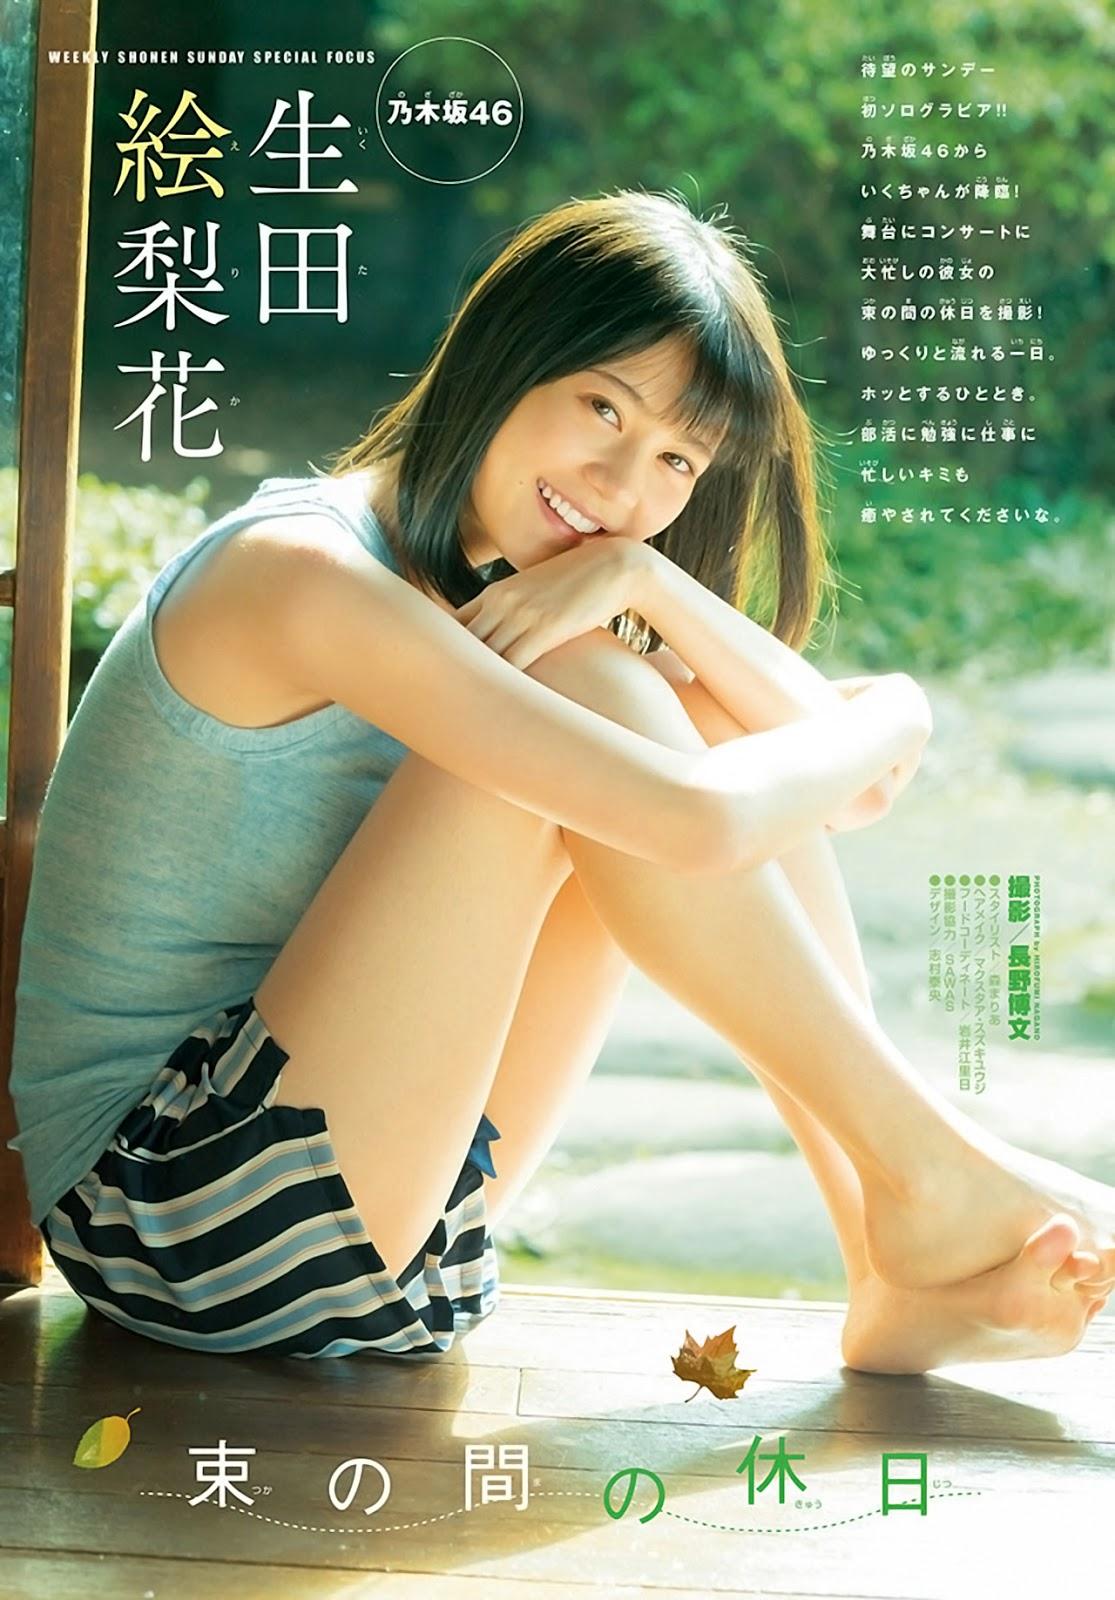 Ikuta Erika 生田絵梨花, Shonen Sunday 2017 No.50 (週刊少年サンデー 2017年50号)